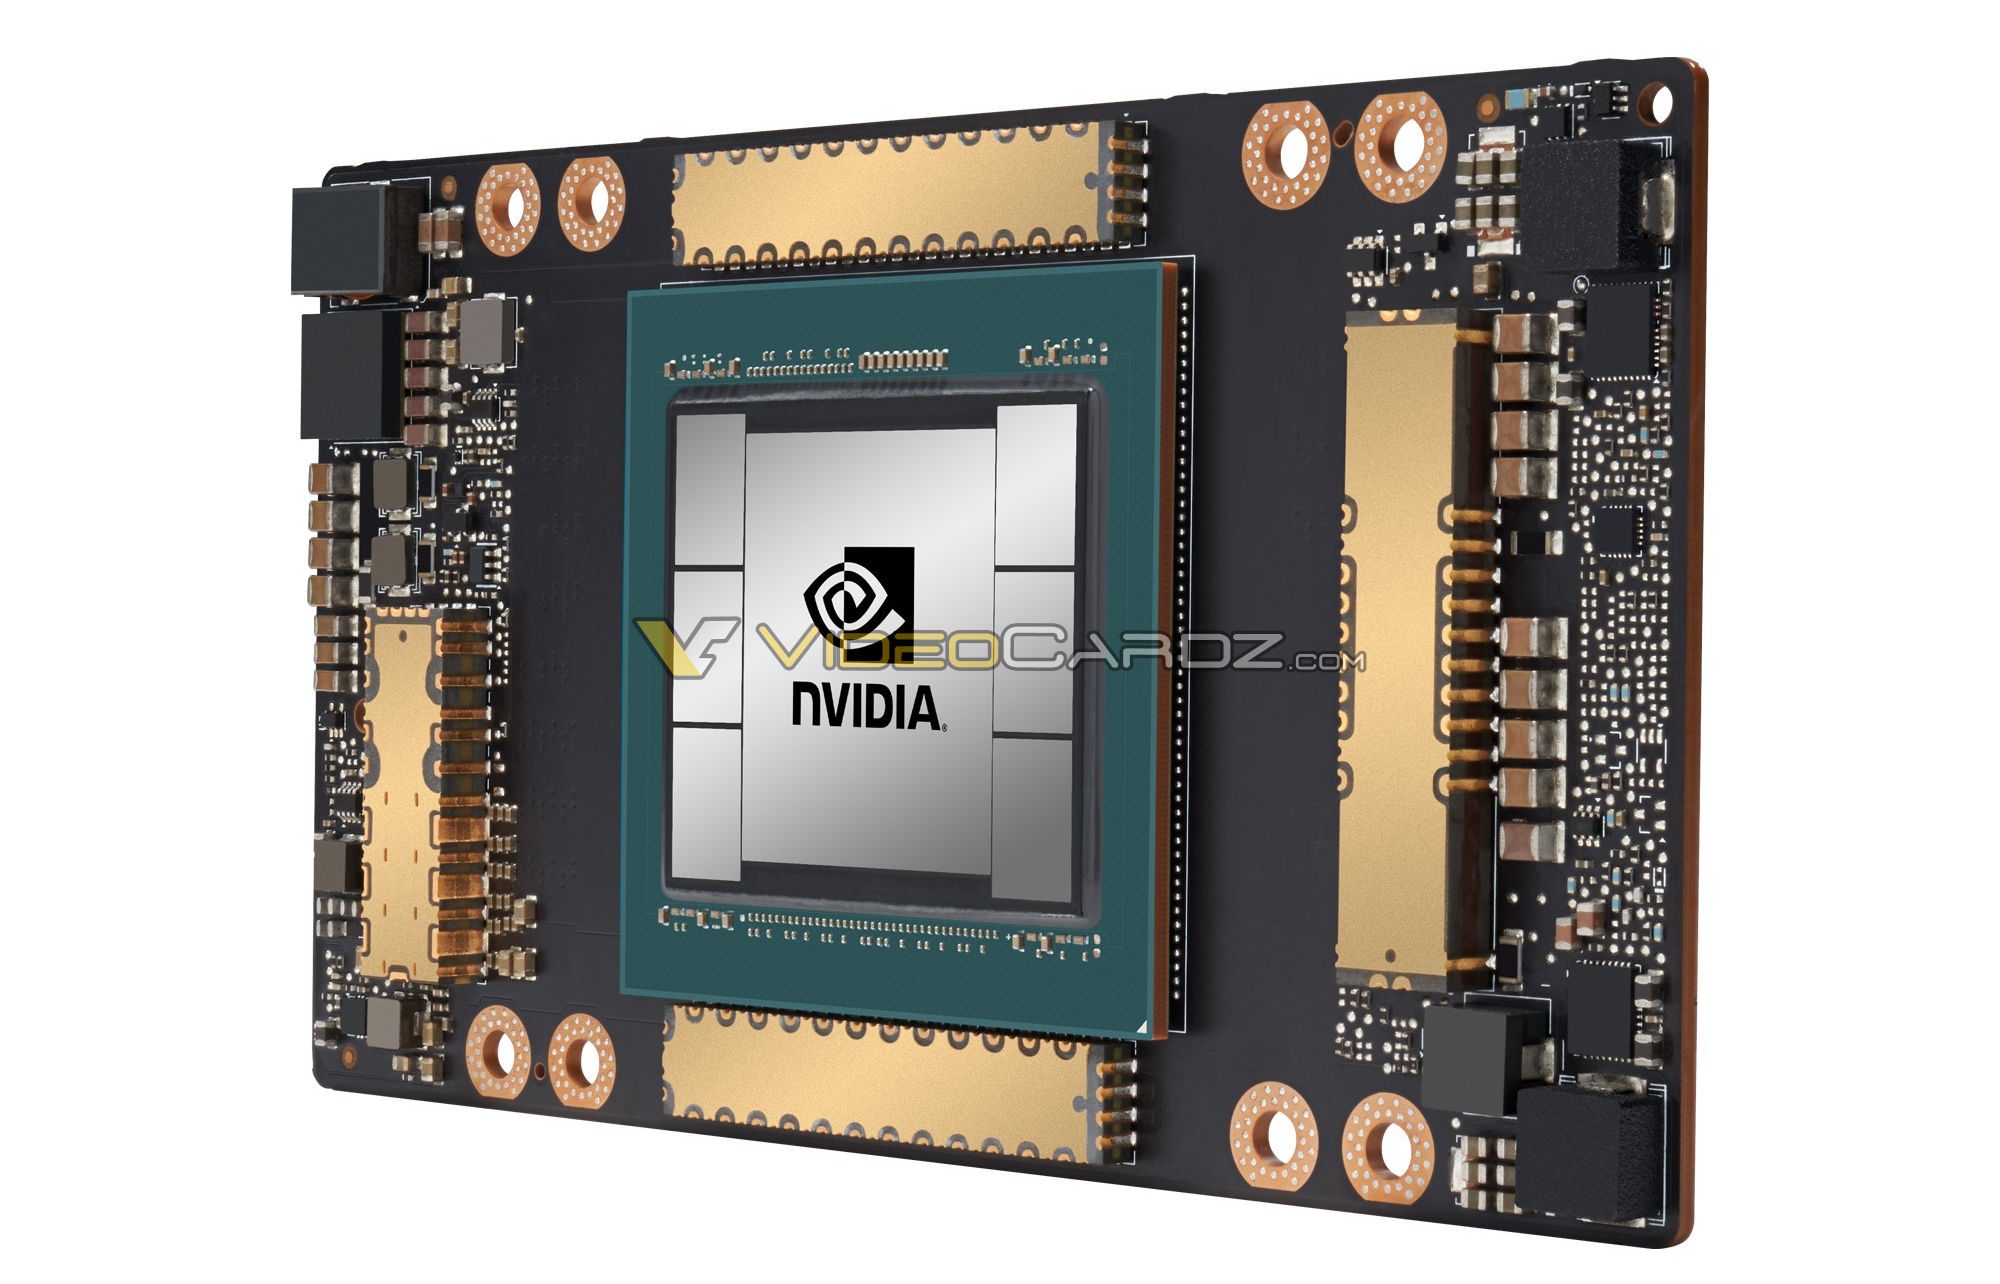 https://www.coolaler.com.tw/image/news/20/05/NVIDIA-GA100-GPU-Tesla-A100.jpg